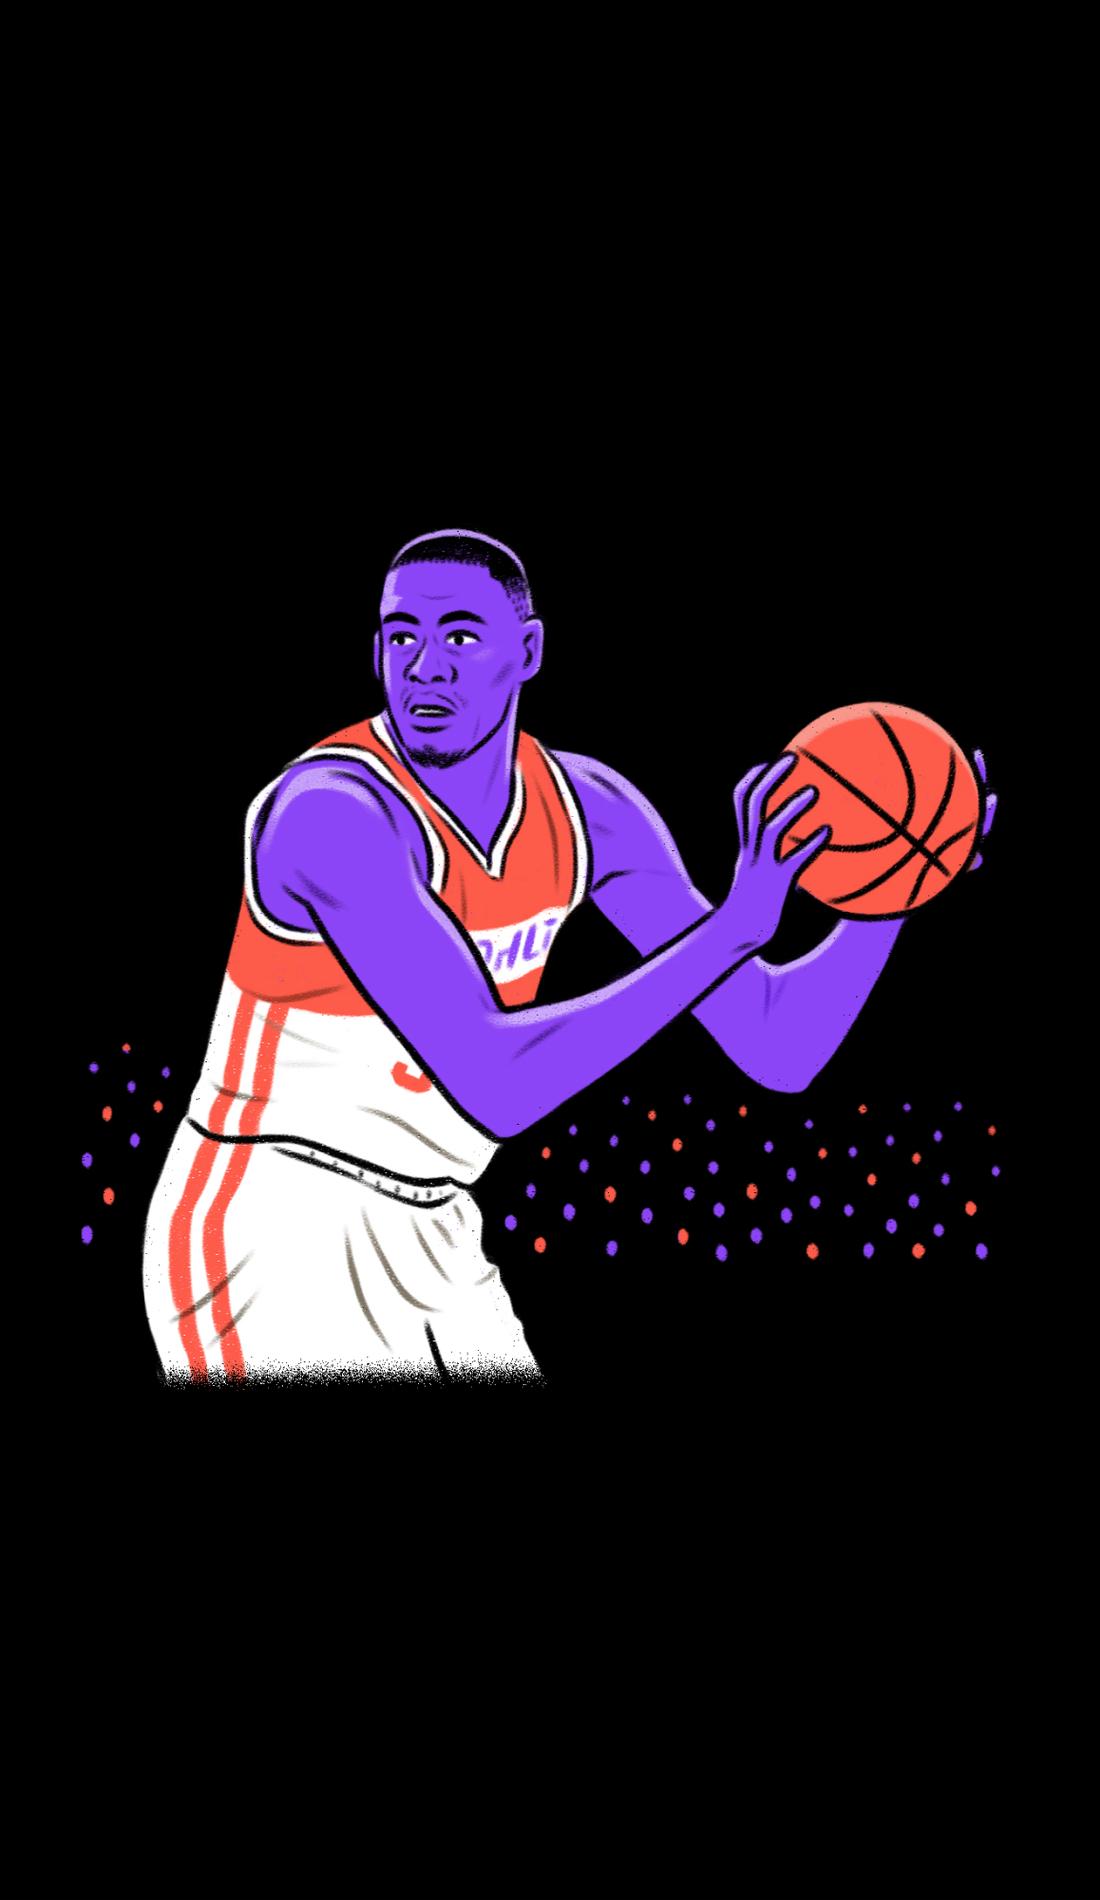 A Oklahoma State Cowboys Basketball live event